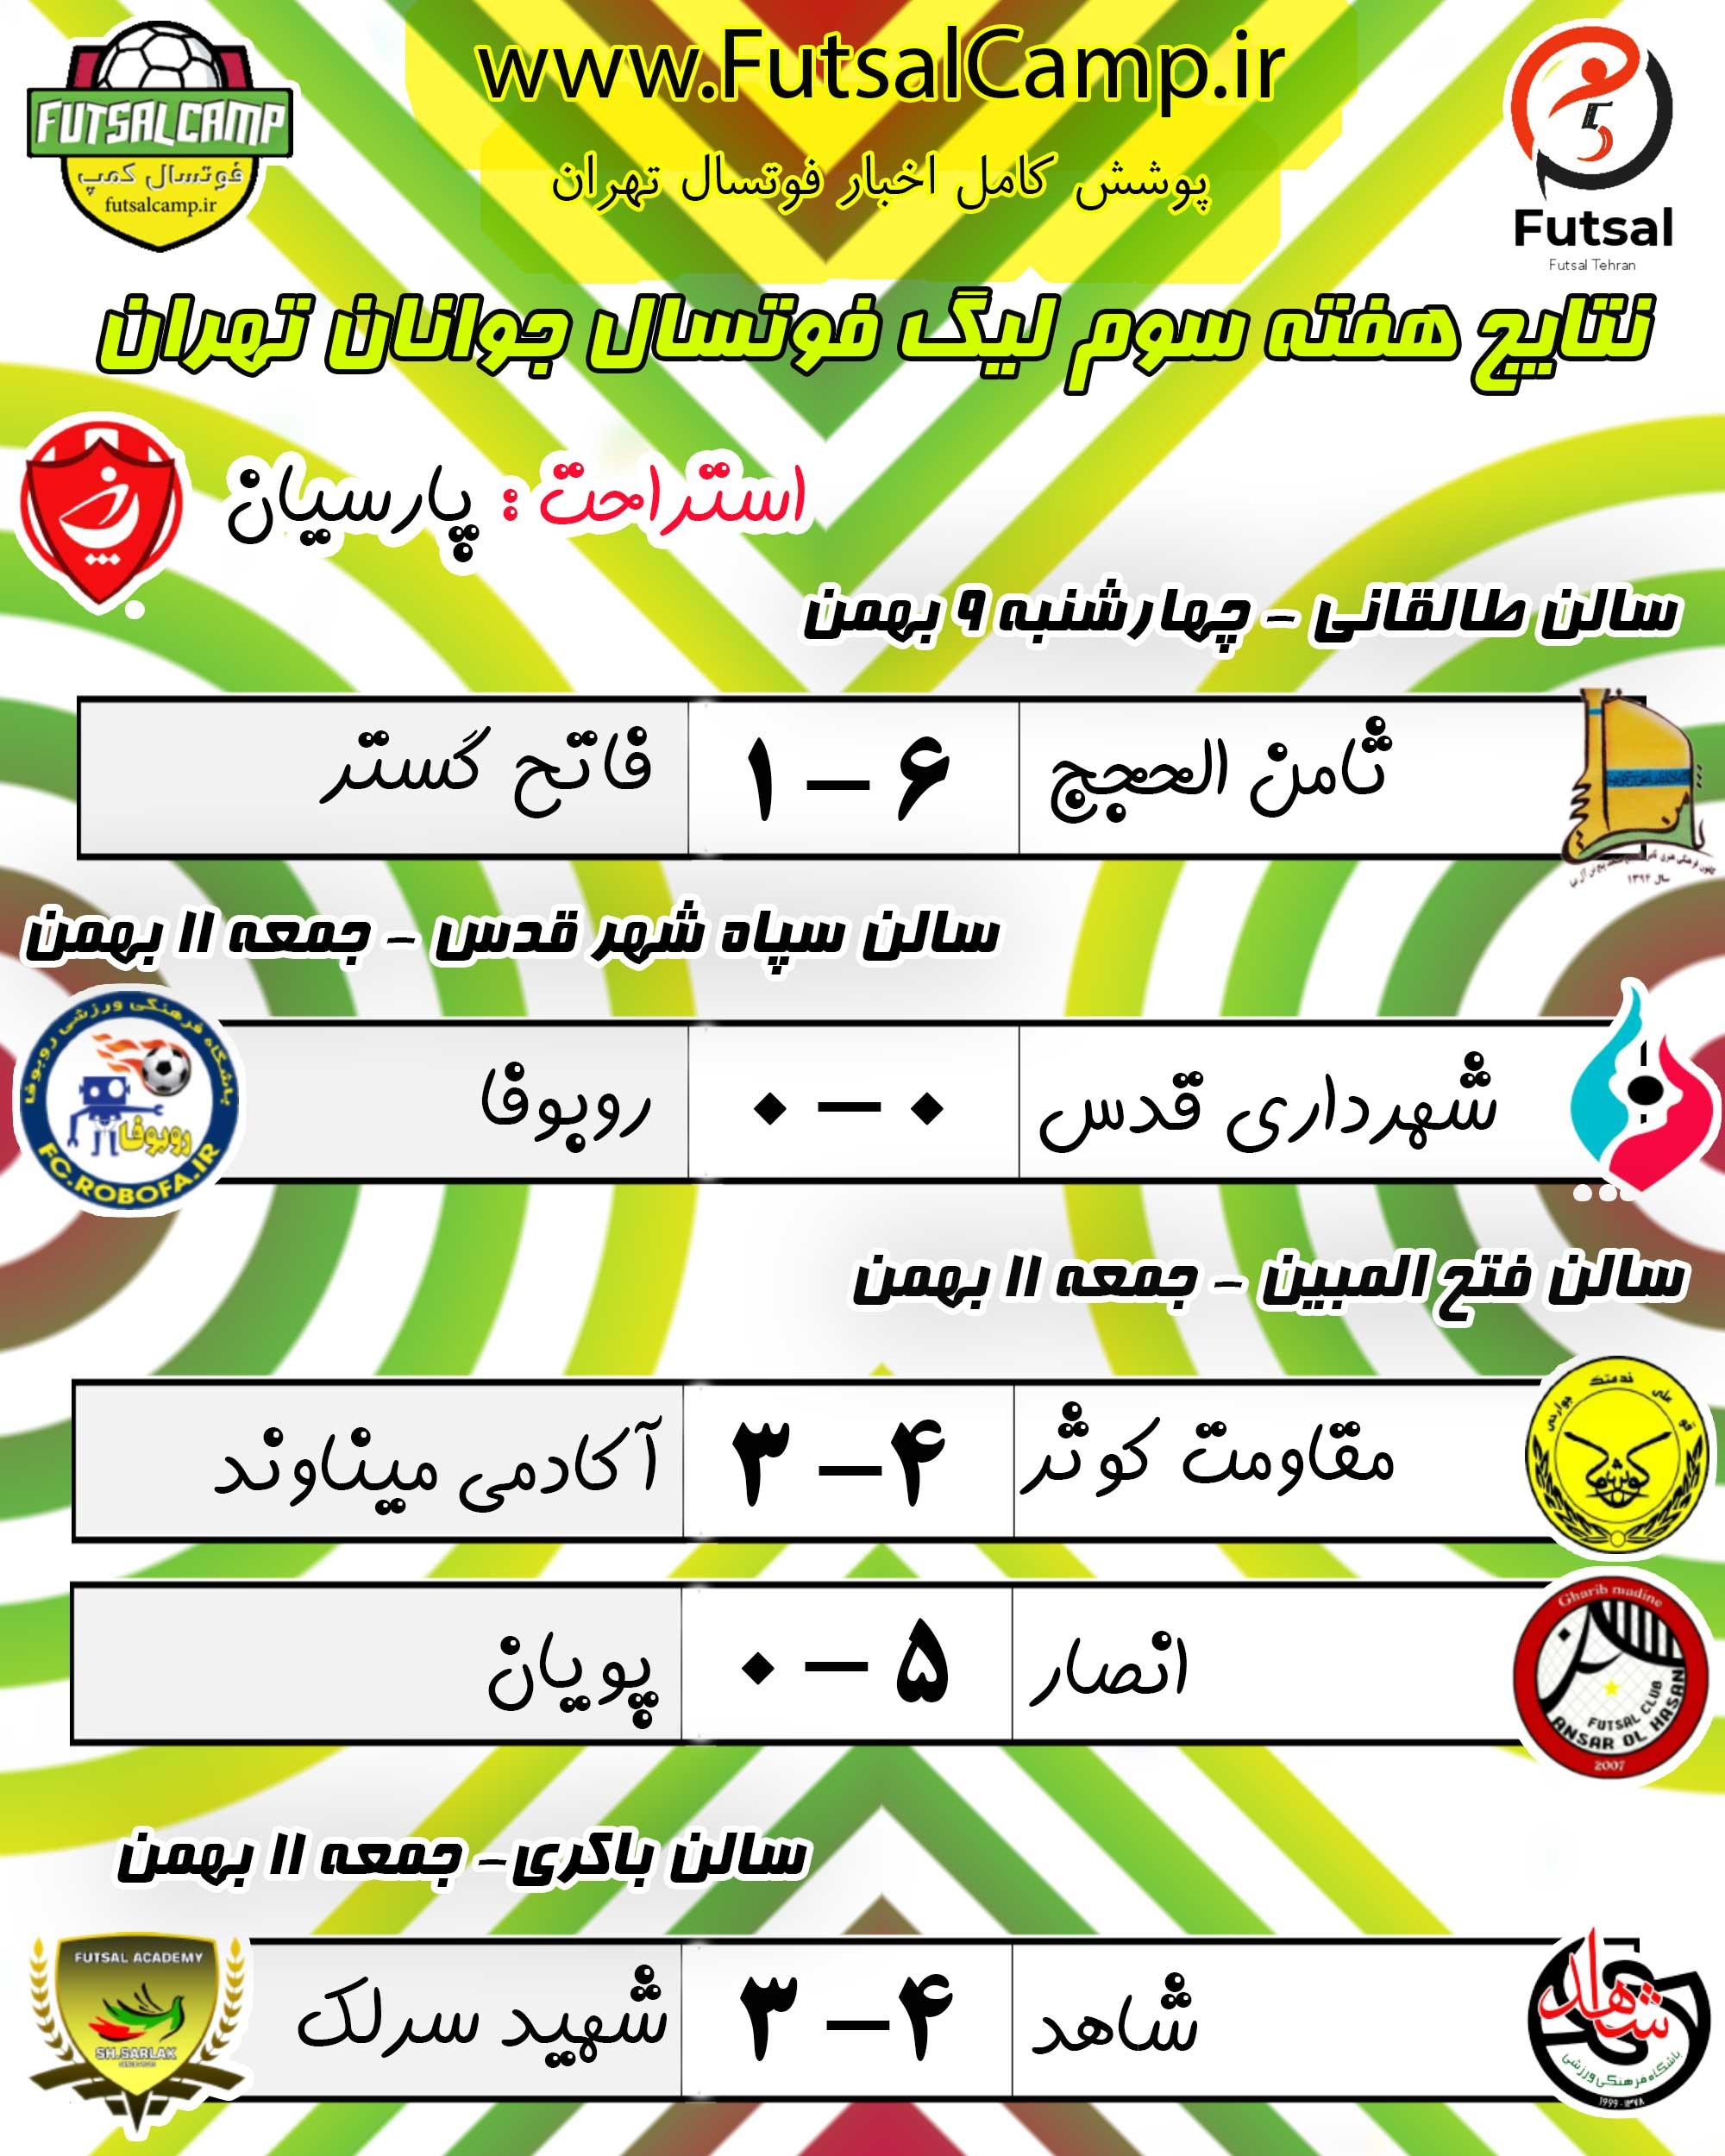 نتایج هفته سوم لیگ فوتسال جوانان تهران